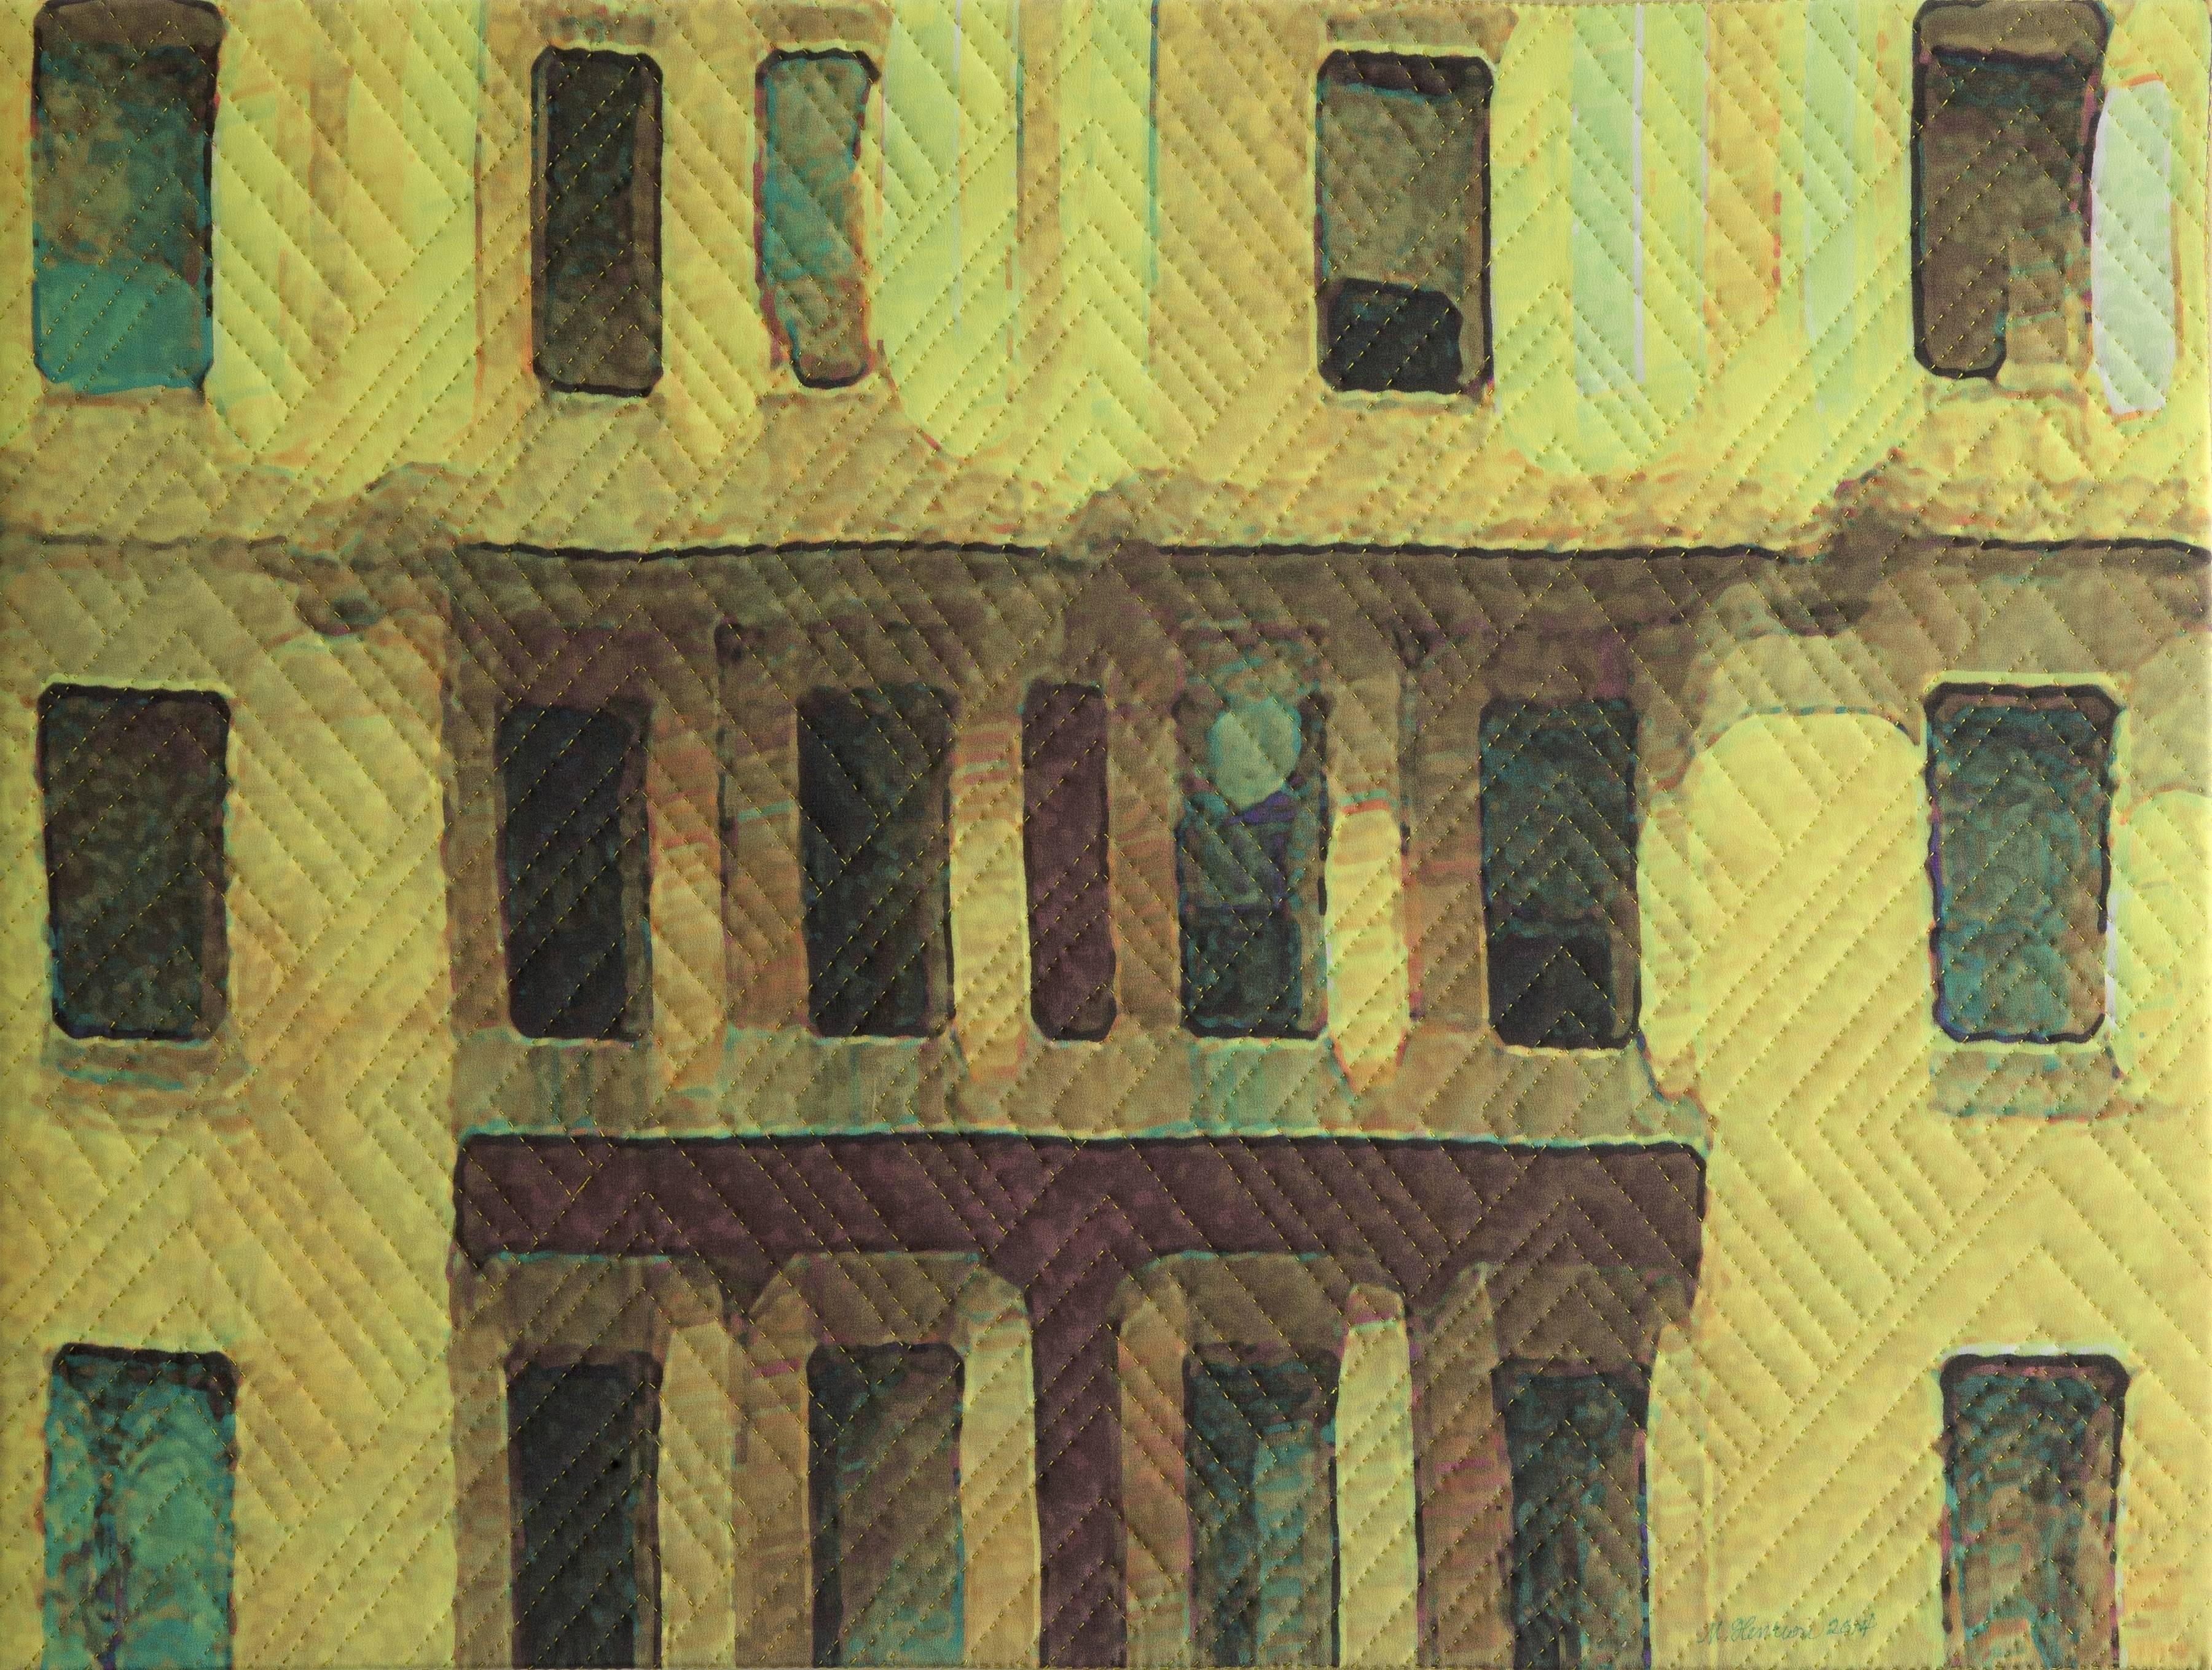 New York Windows 1432, Mixed Media on Canvas